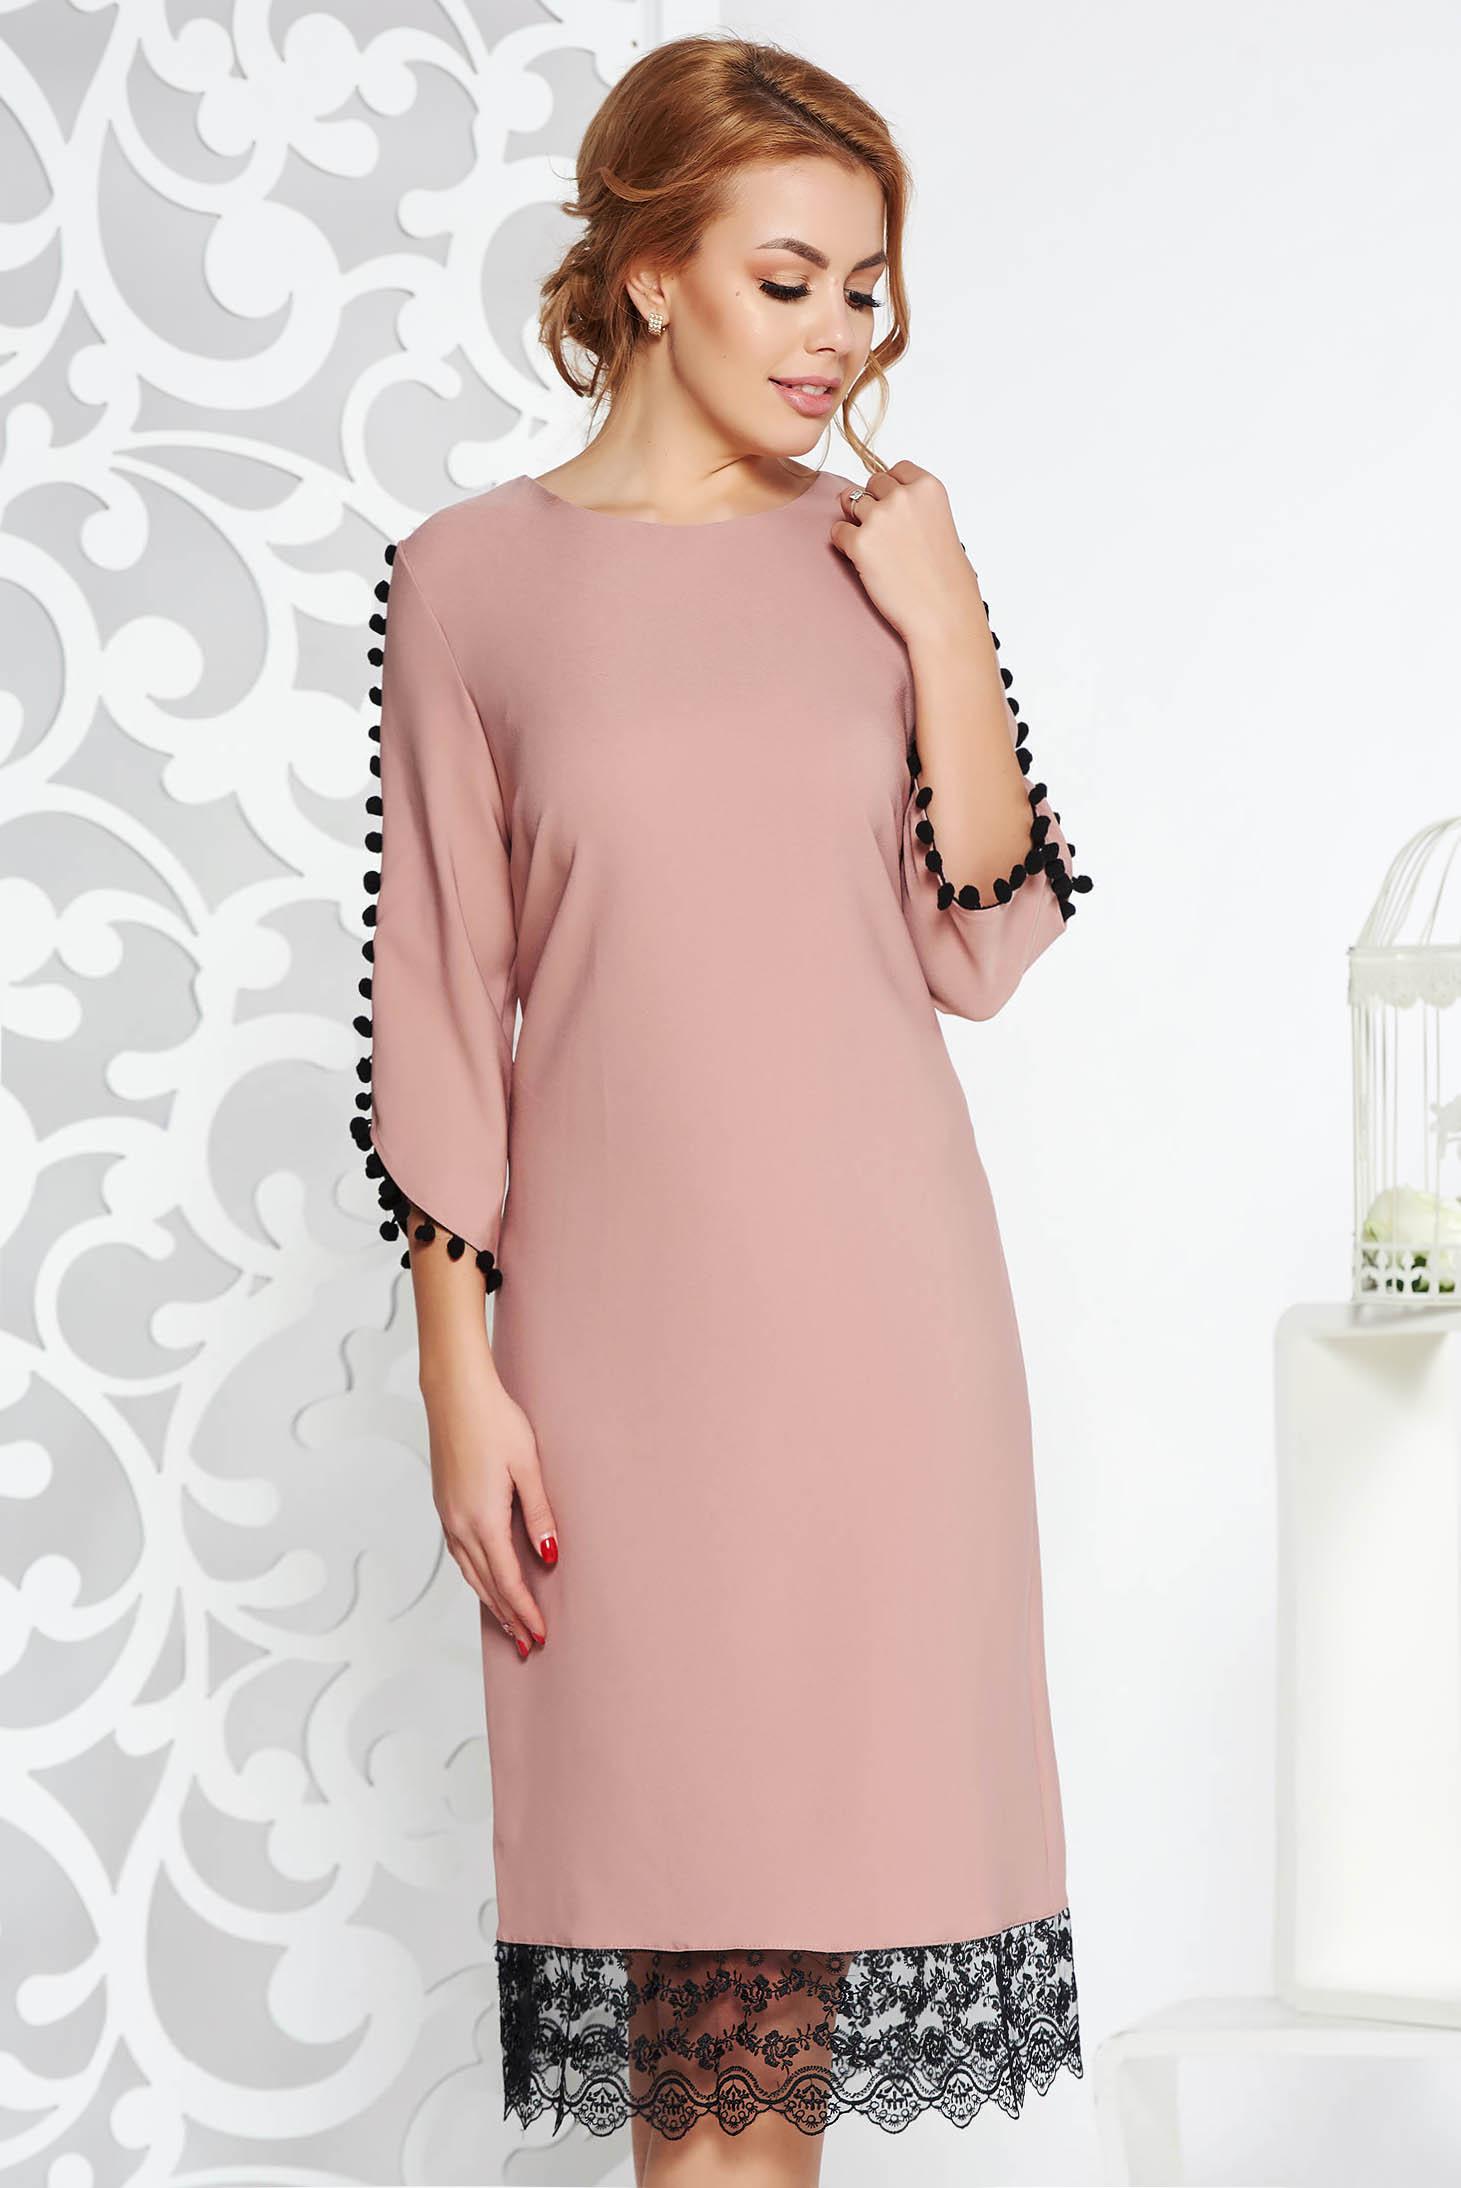 Rochie rosa eleganta cu croi larg din material usor elastic cu aplicatii de dantela cu ciucuri